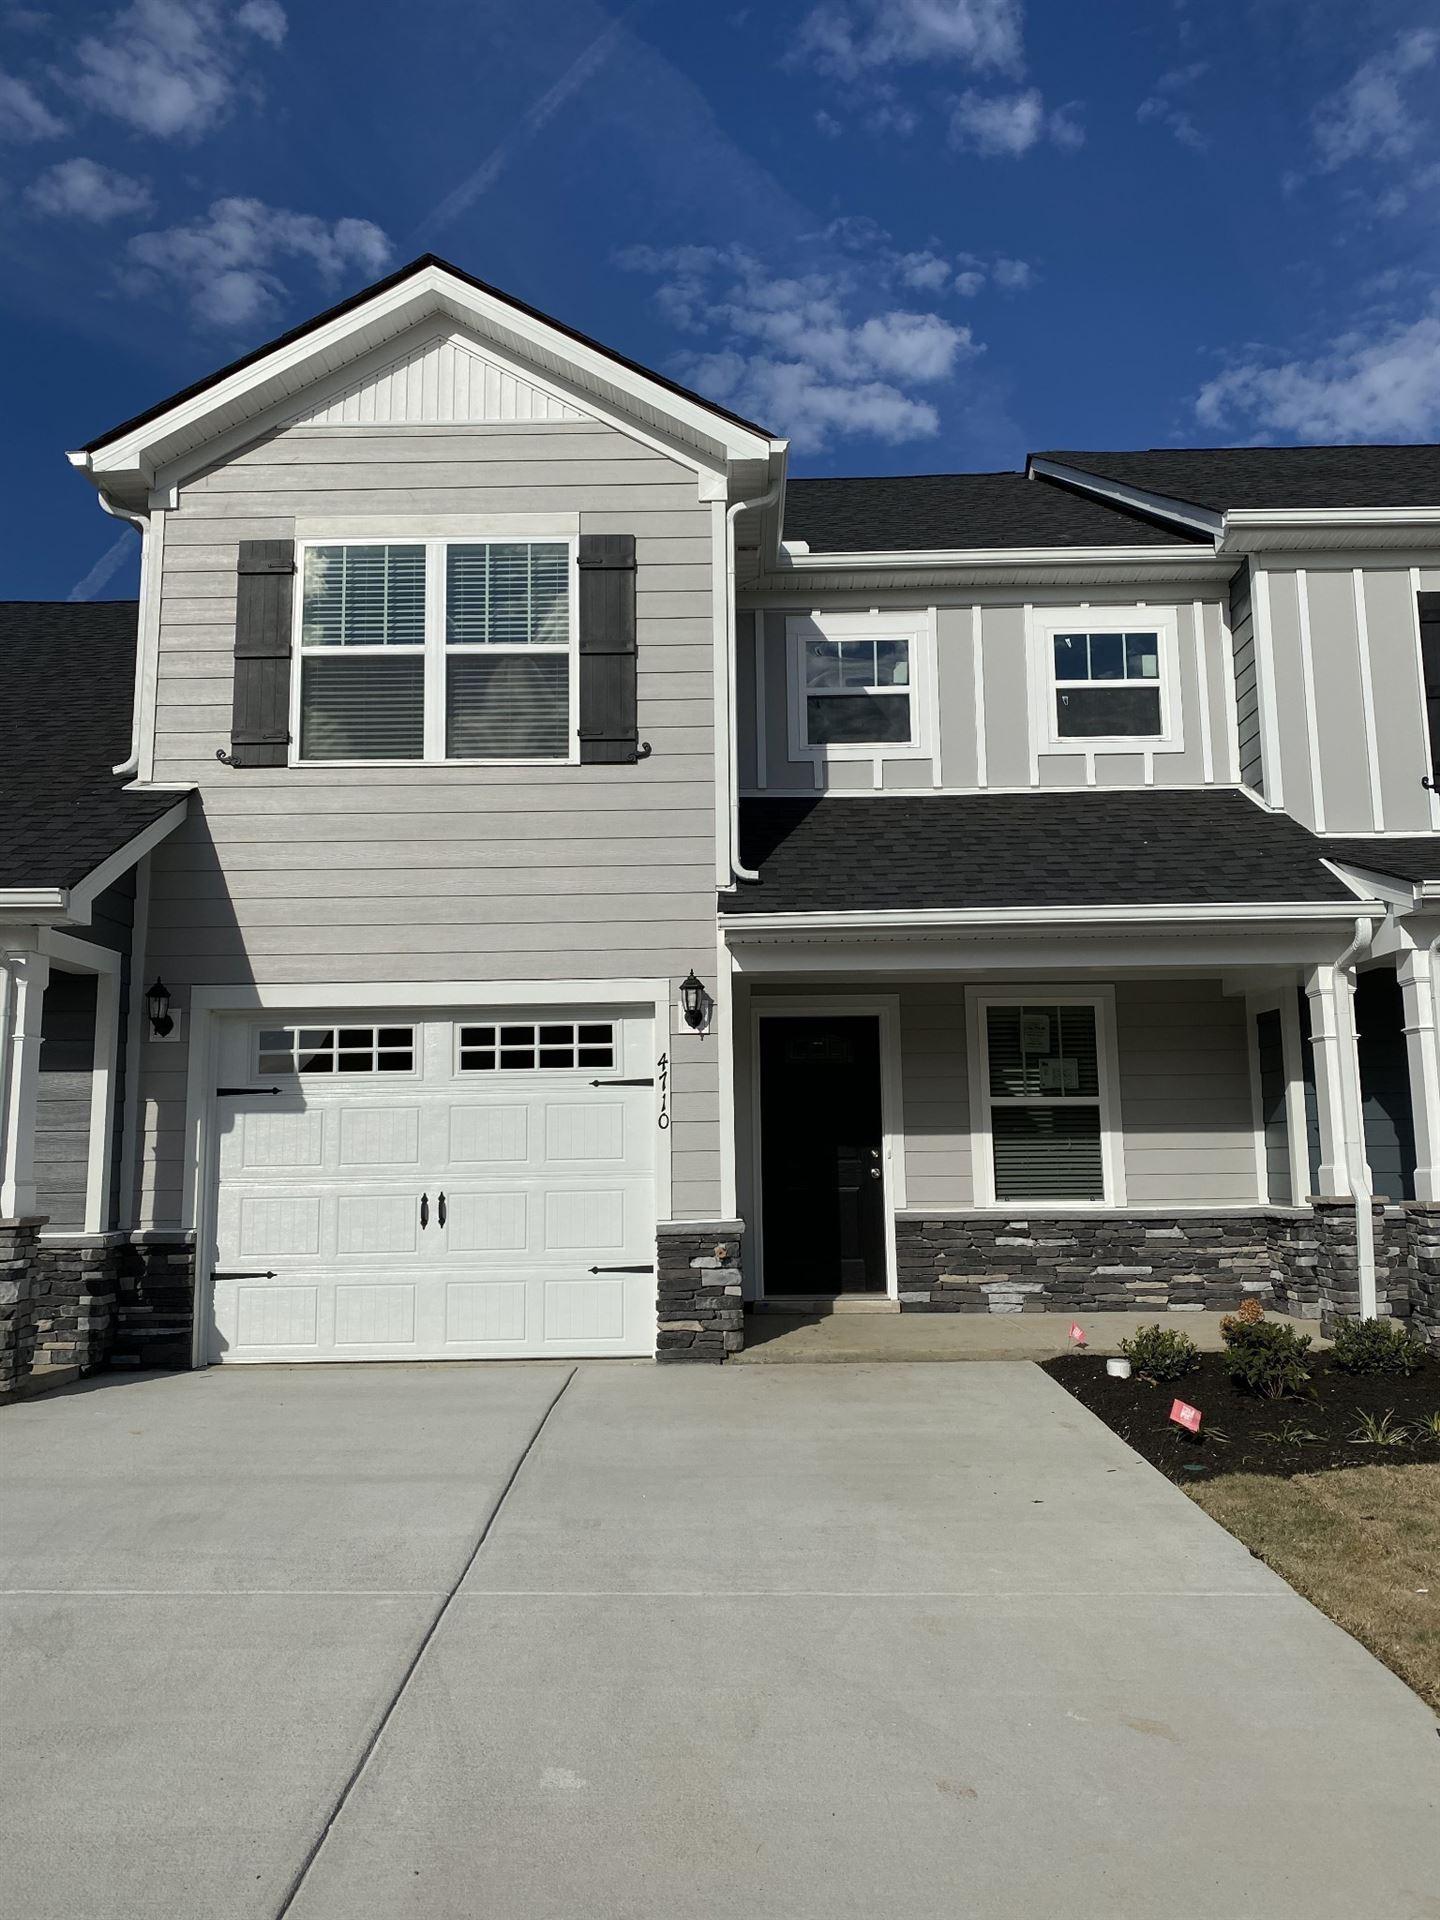 1616 Calypso Drive Lot 105 #105, Murfreesboro, TN 37128 - MLS#: 2218508